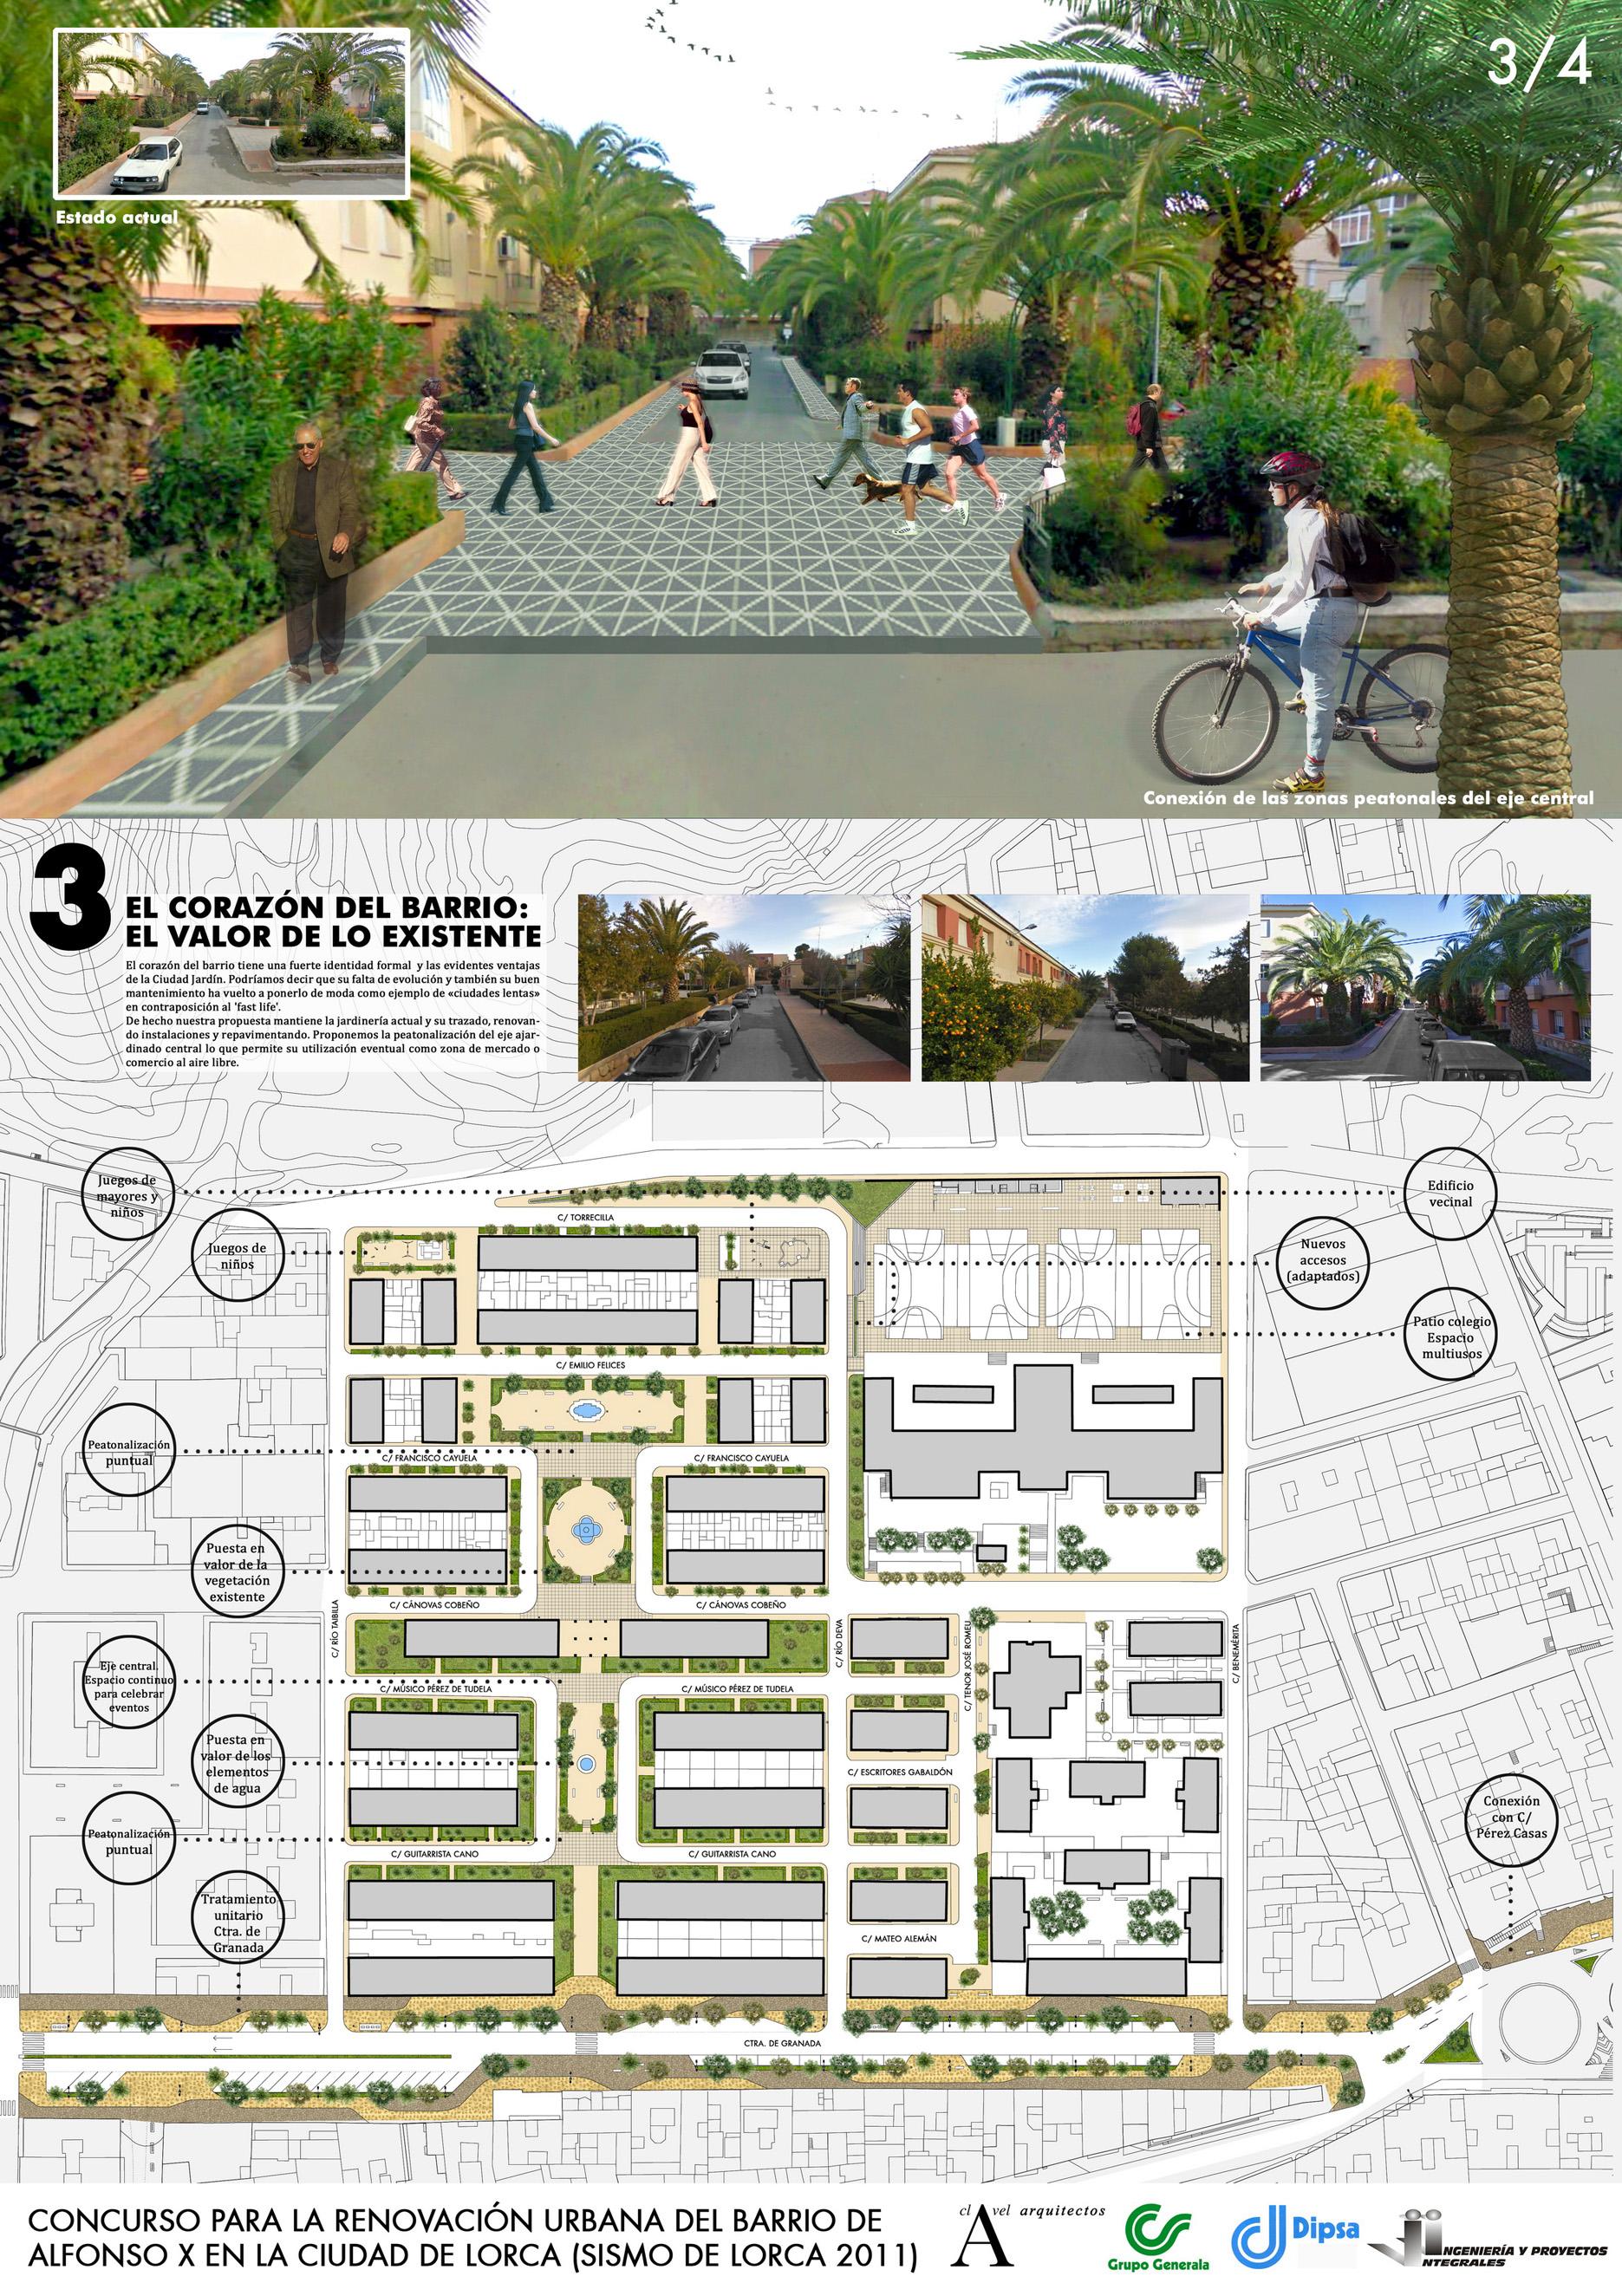 Renovación urbana del barrio Alfonso X